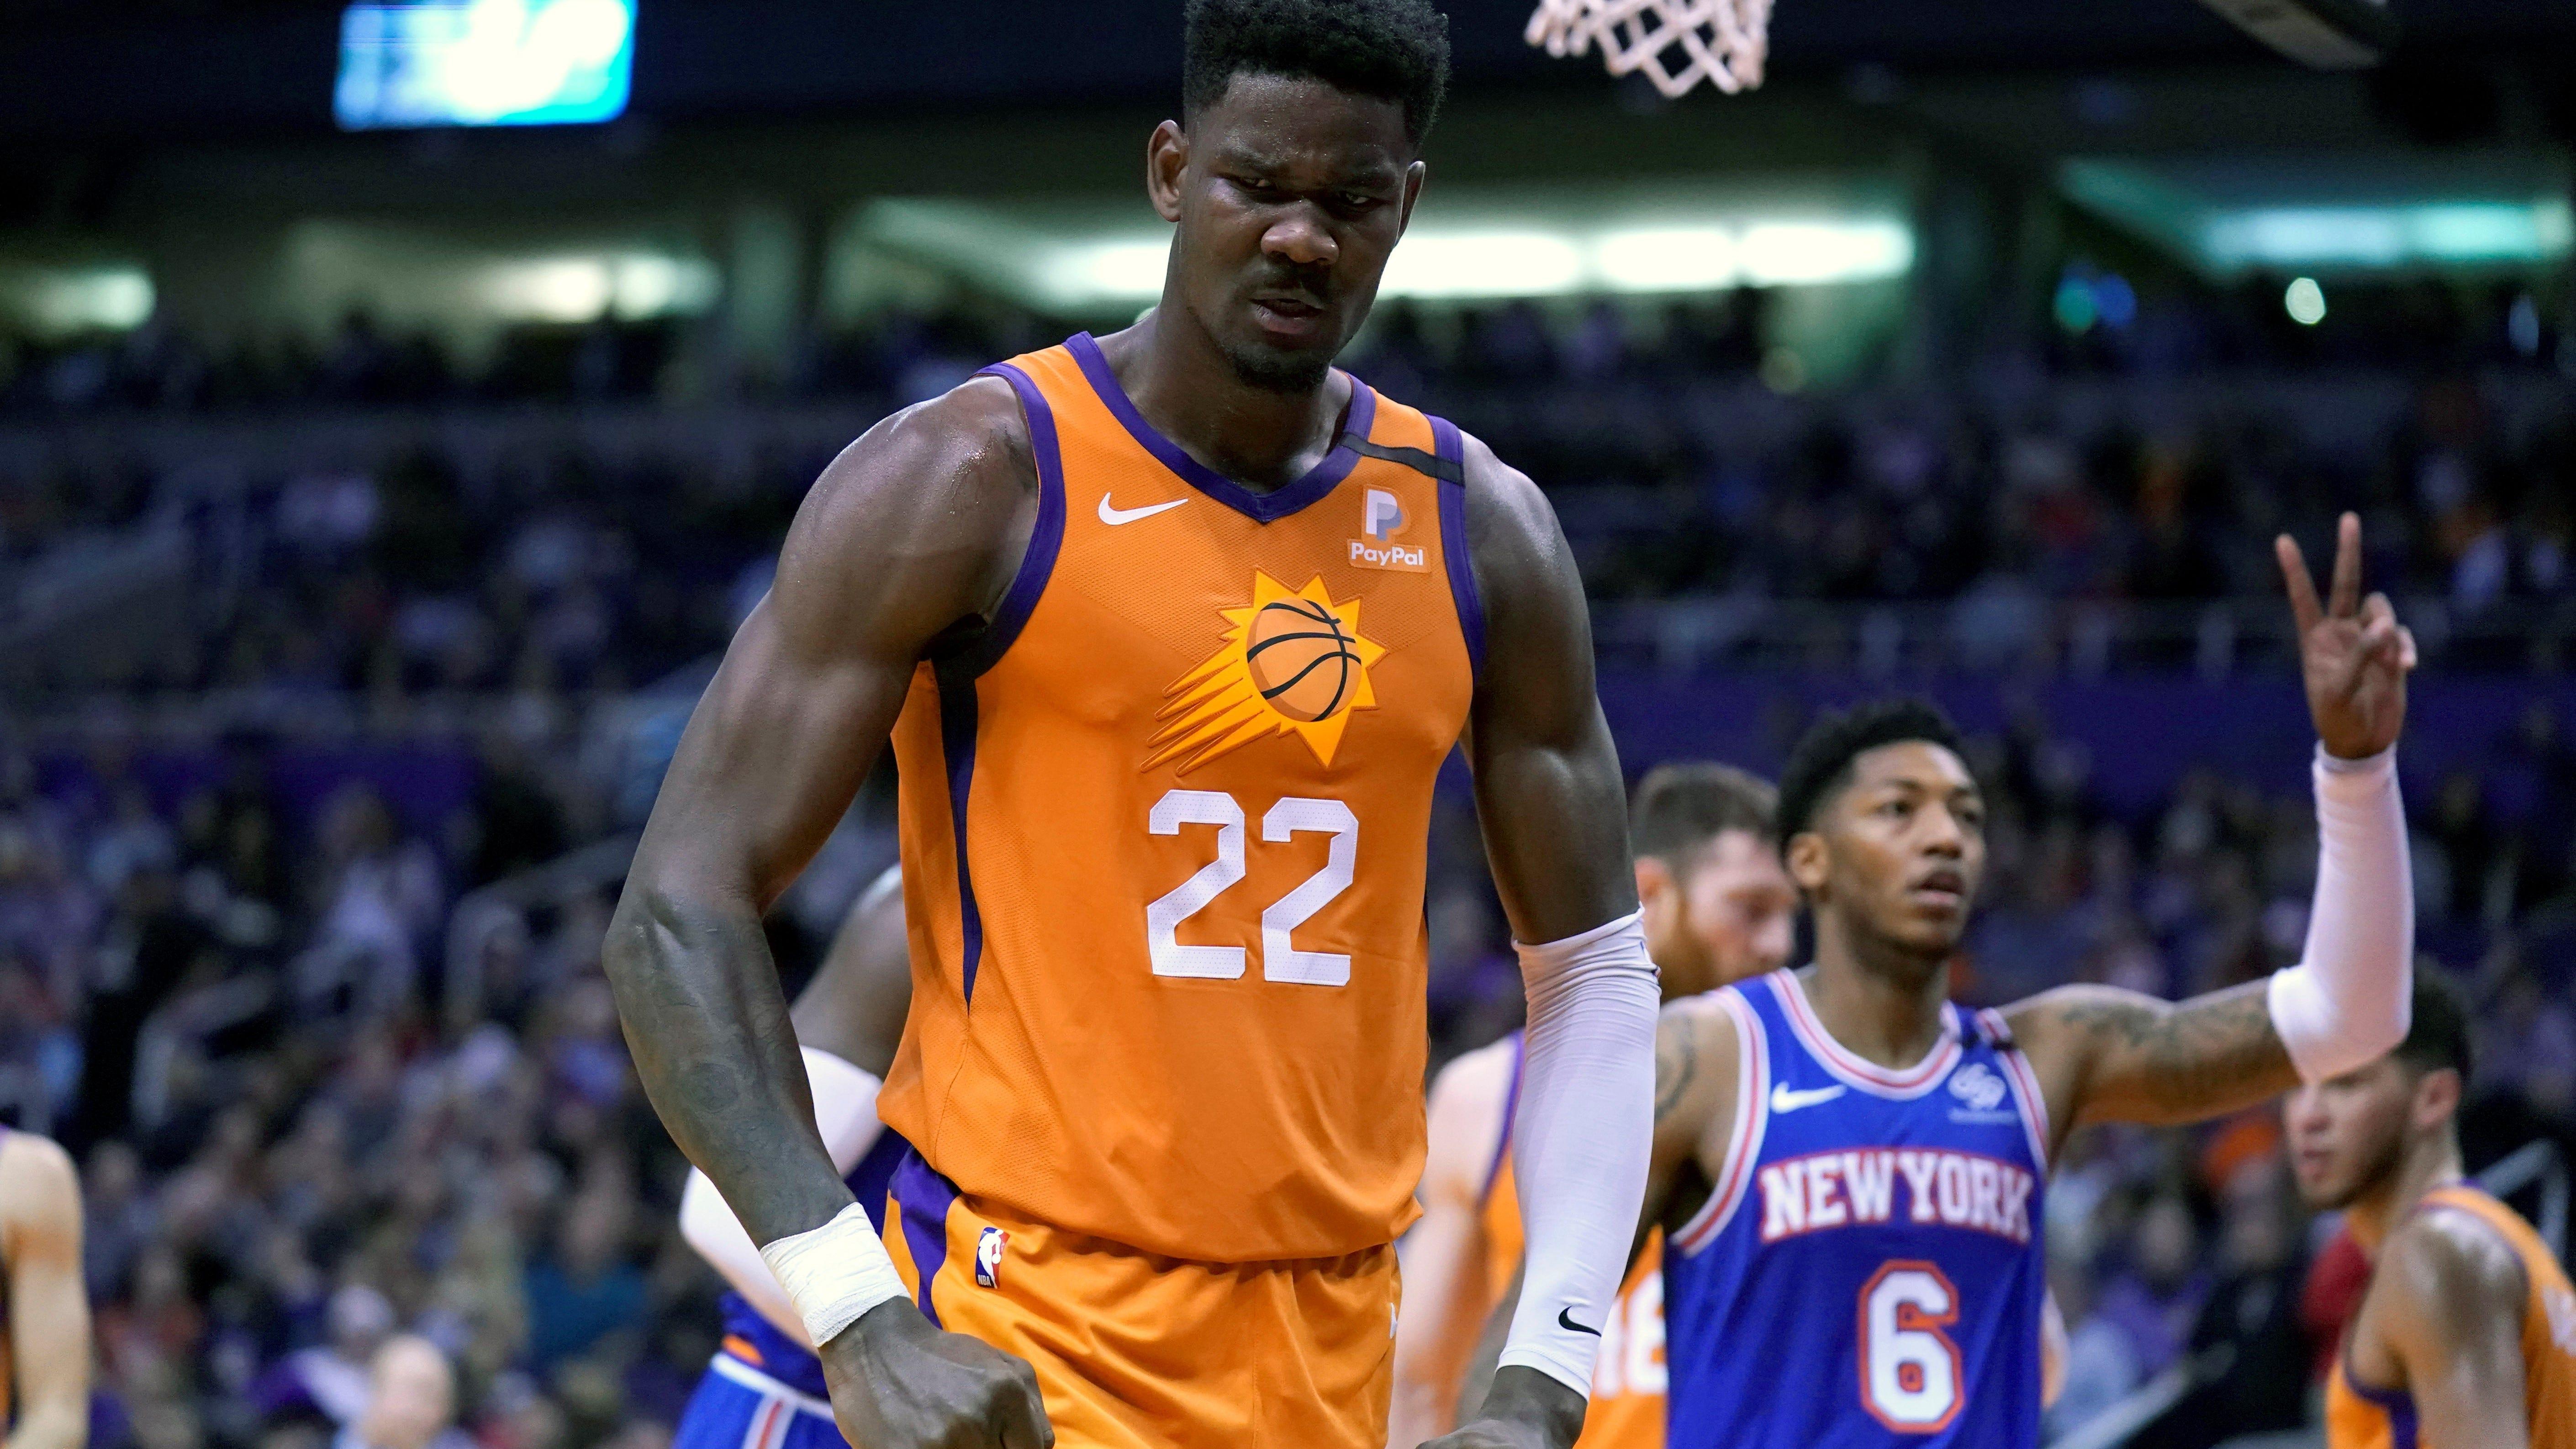 Phoenix Suns Phoenix Suns in Orlando: Should Deandre Ayton, not Devin Booker ...